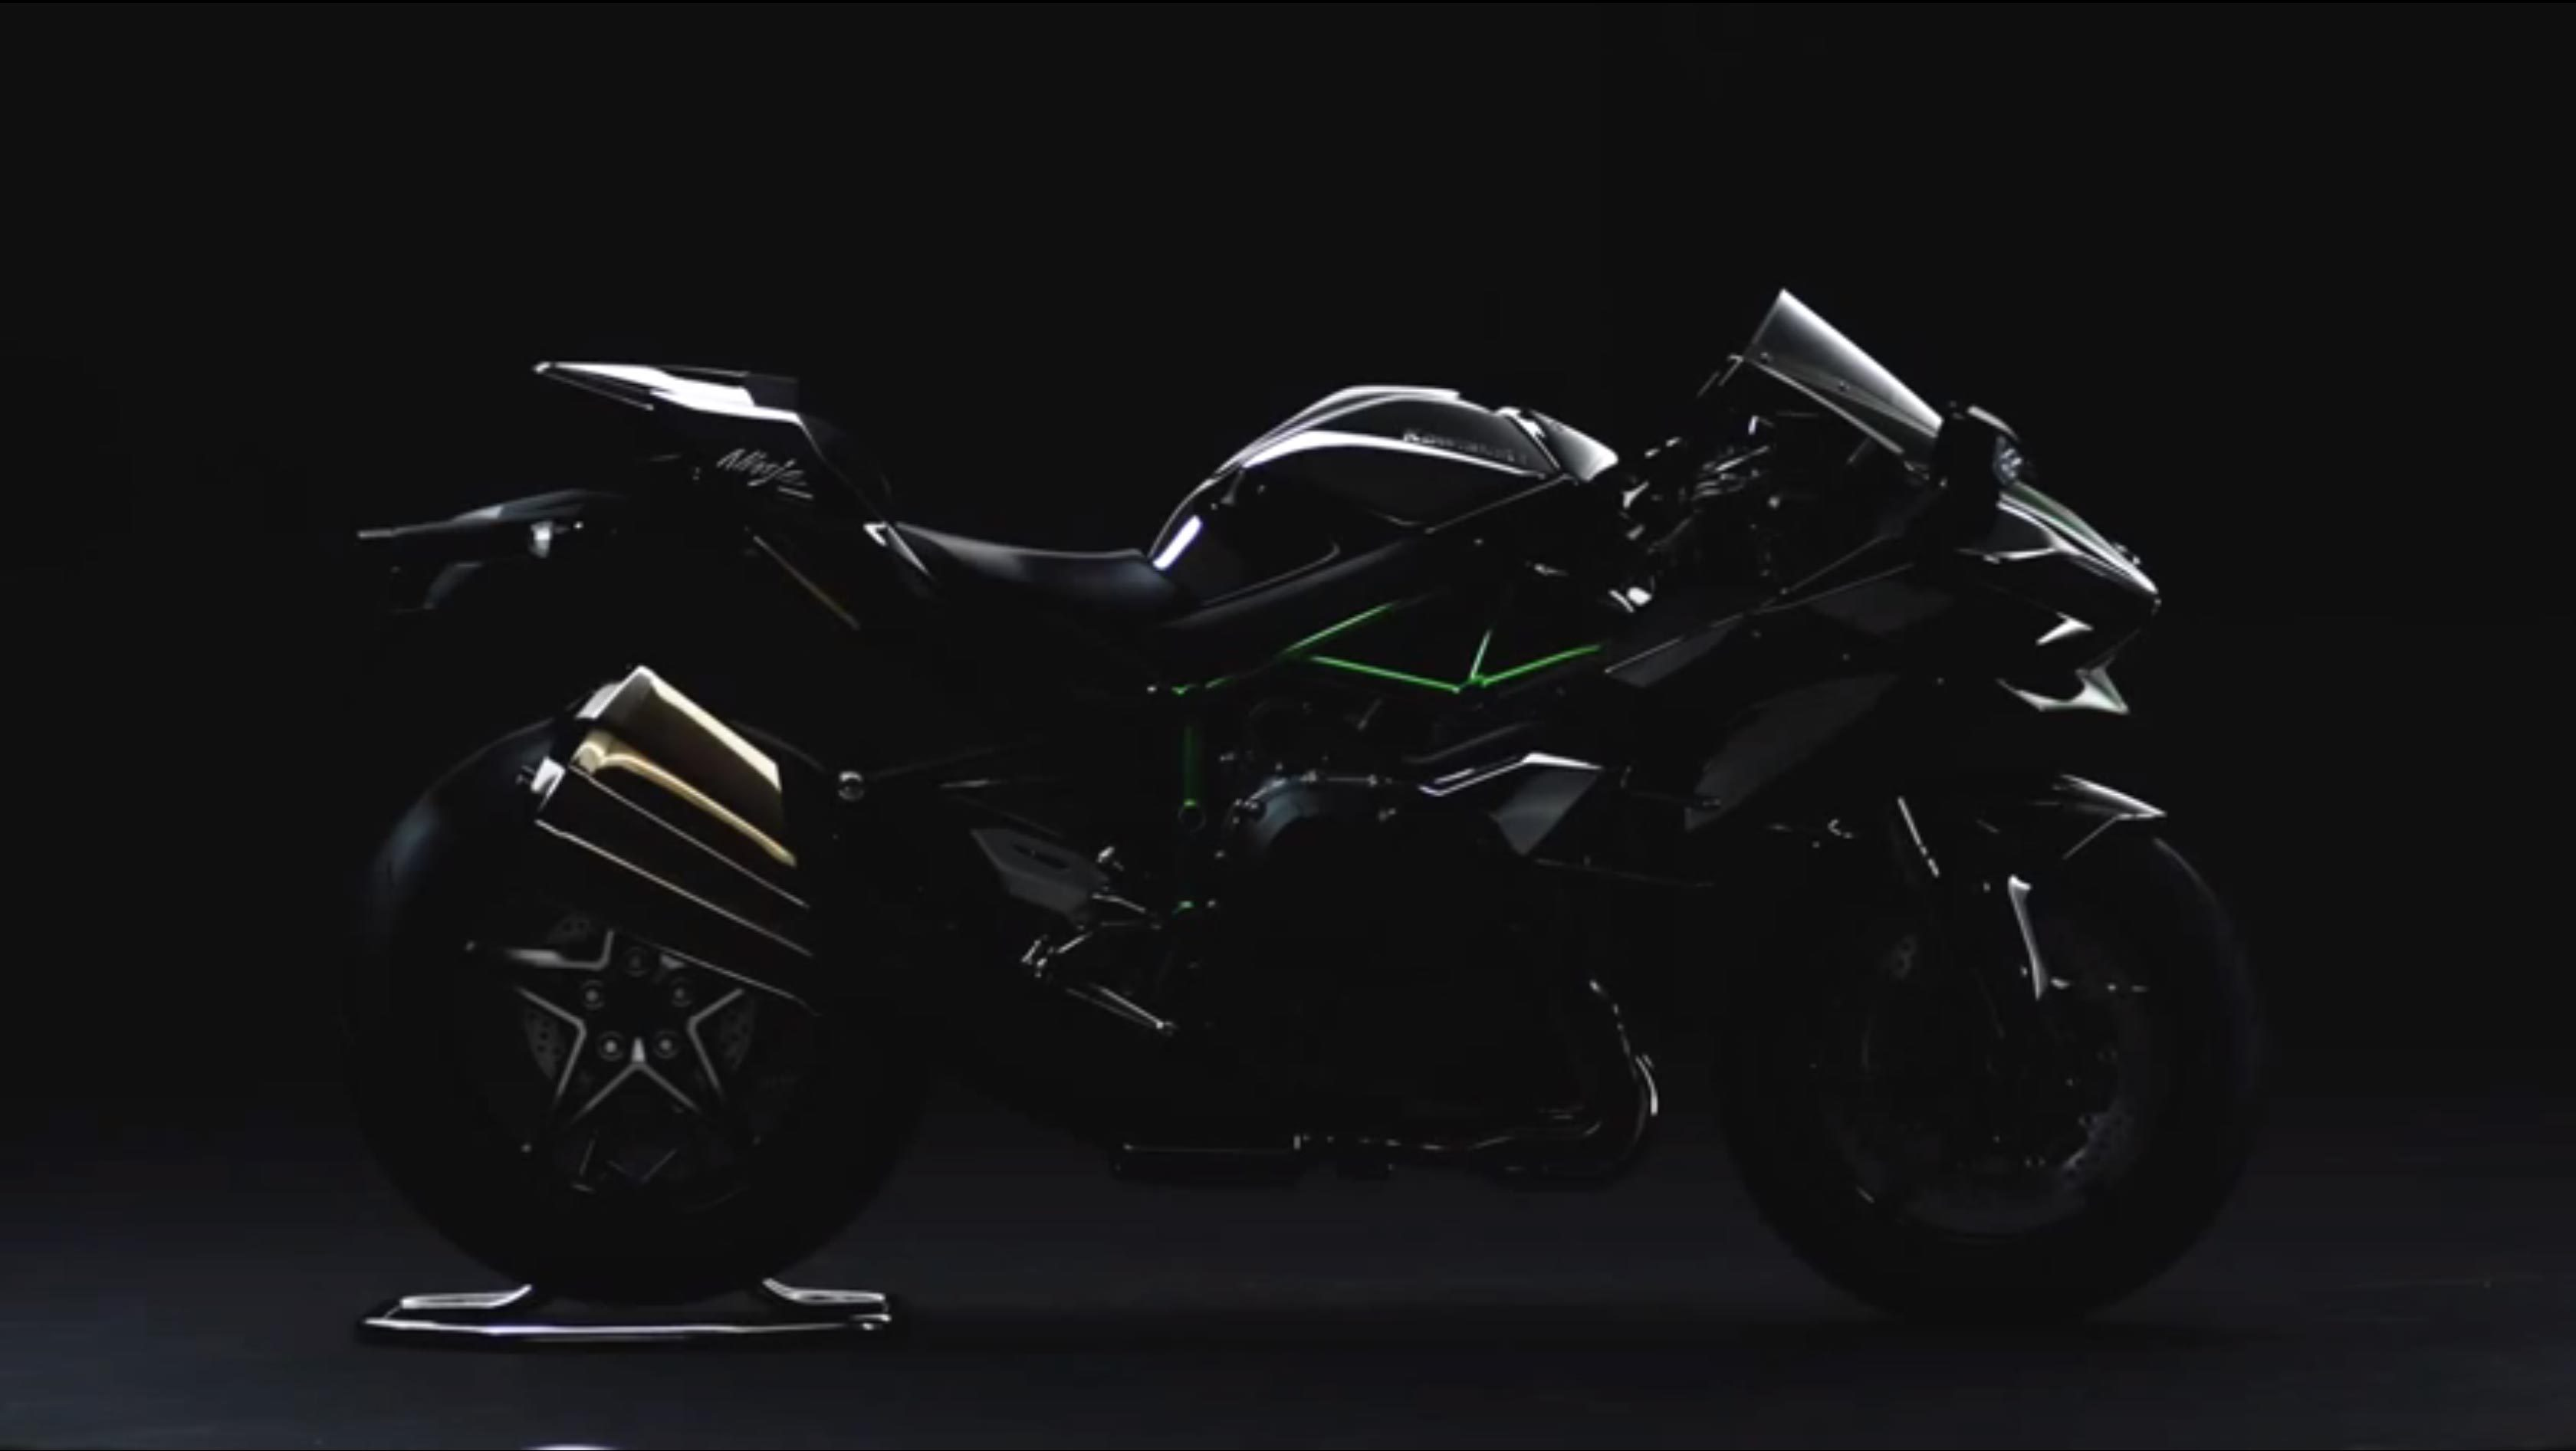 News Kawasaki Ninja H2 Street Revealed And H2R Track Video